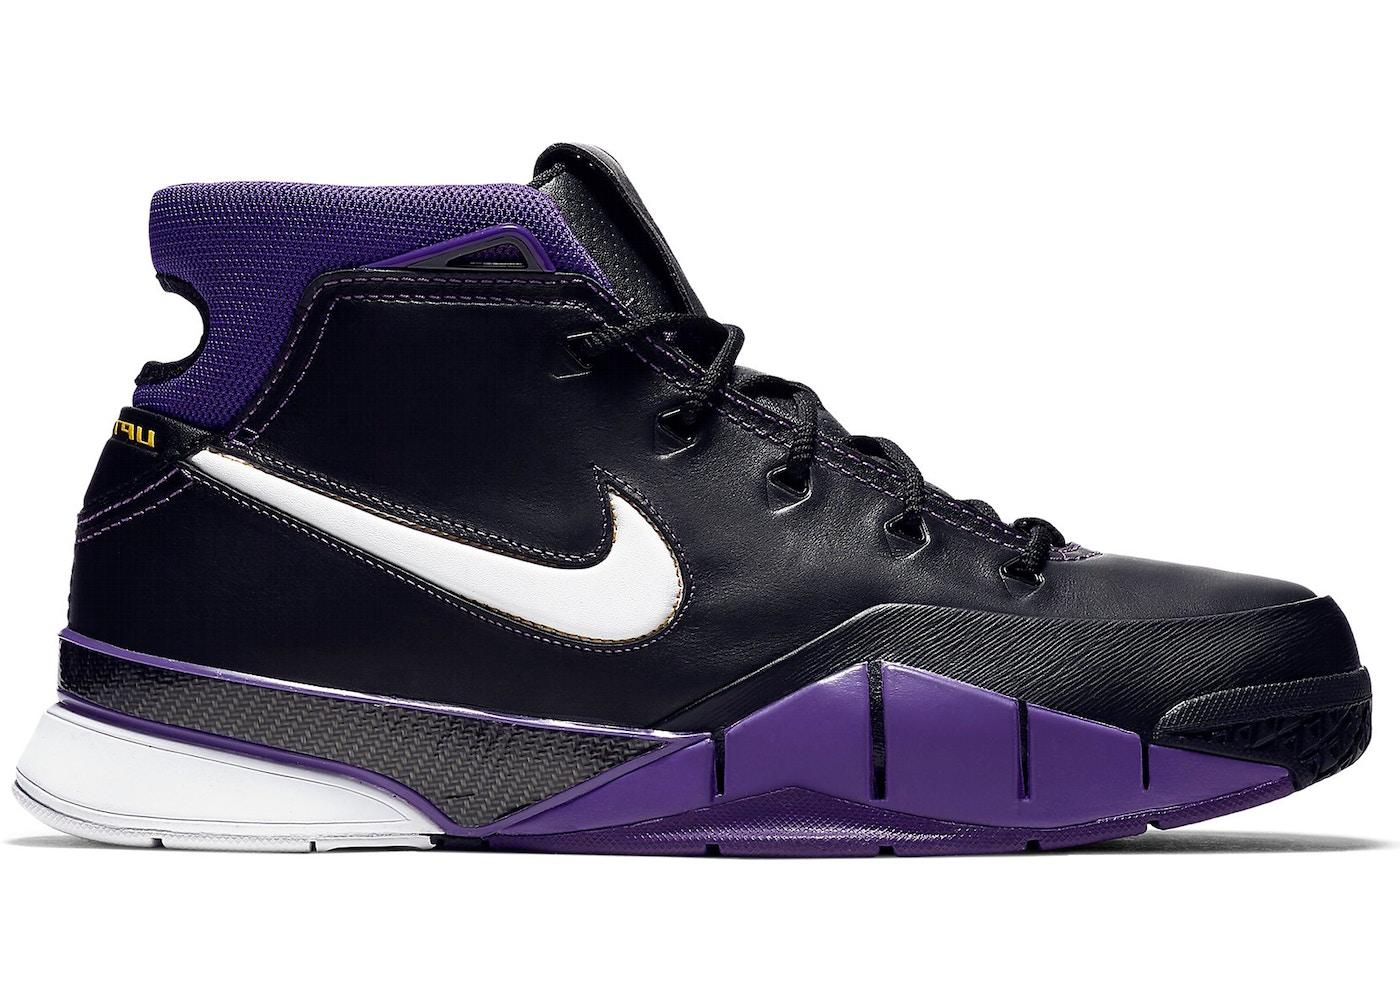 Nike Kobe 1 Protro Purple Reign